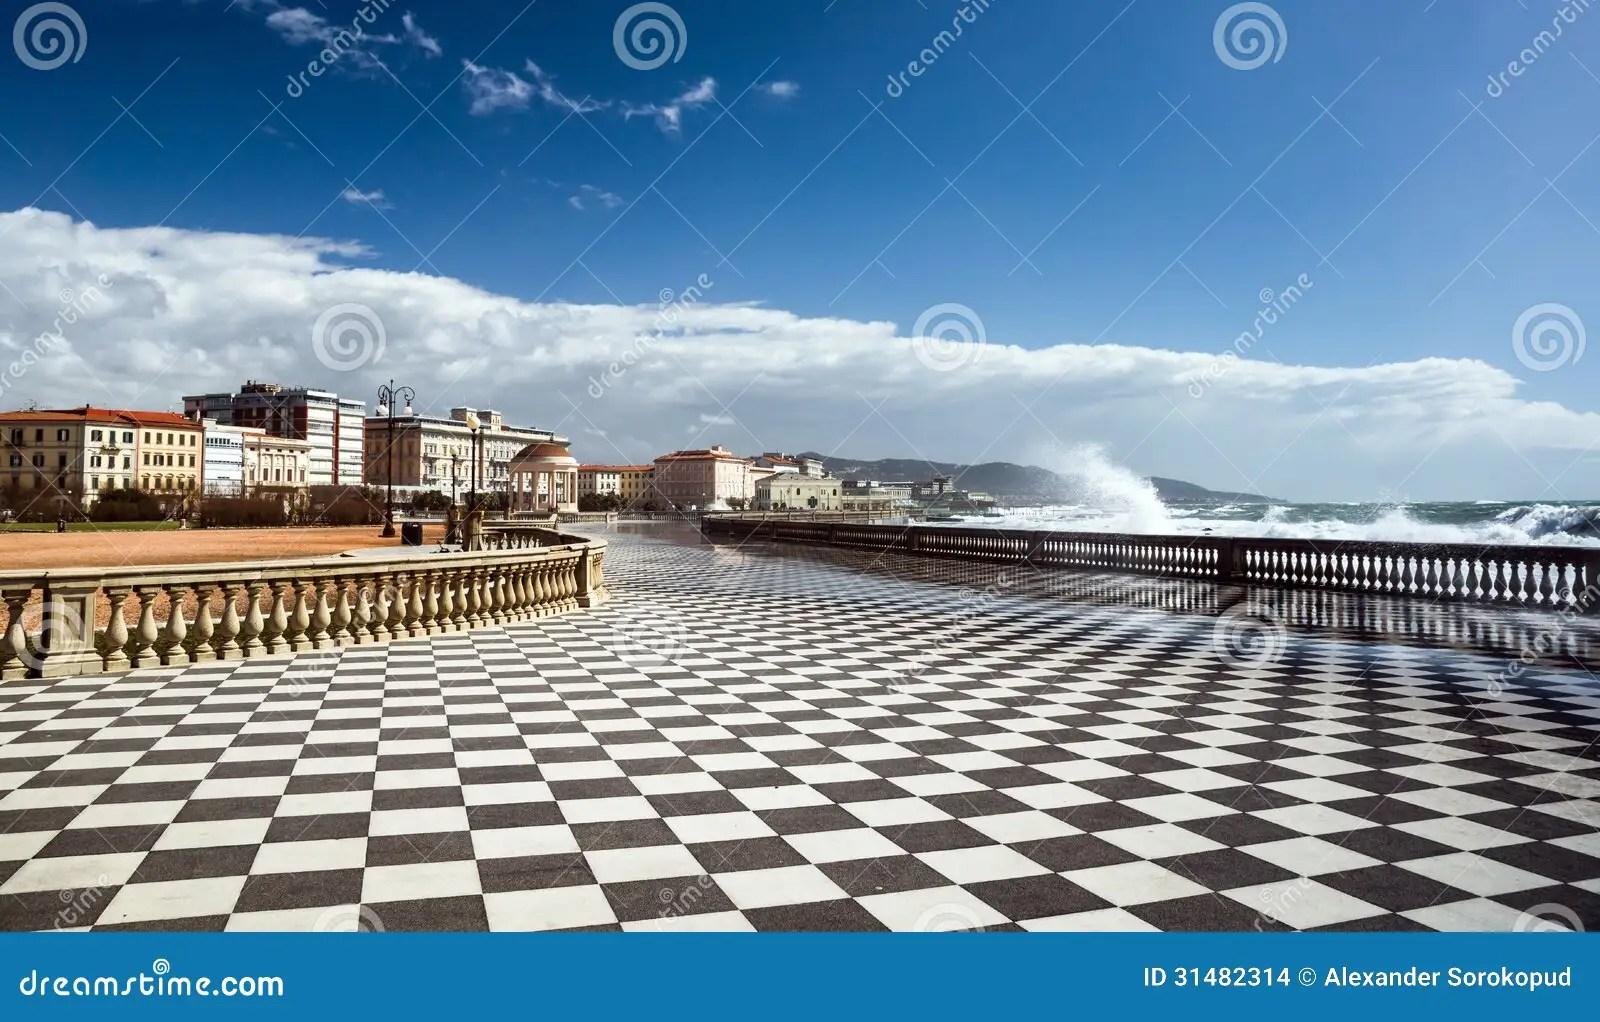 Checkered Floor In City Square Stock Photography  CartoonDealercom 31482314